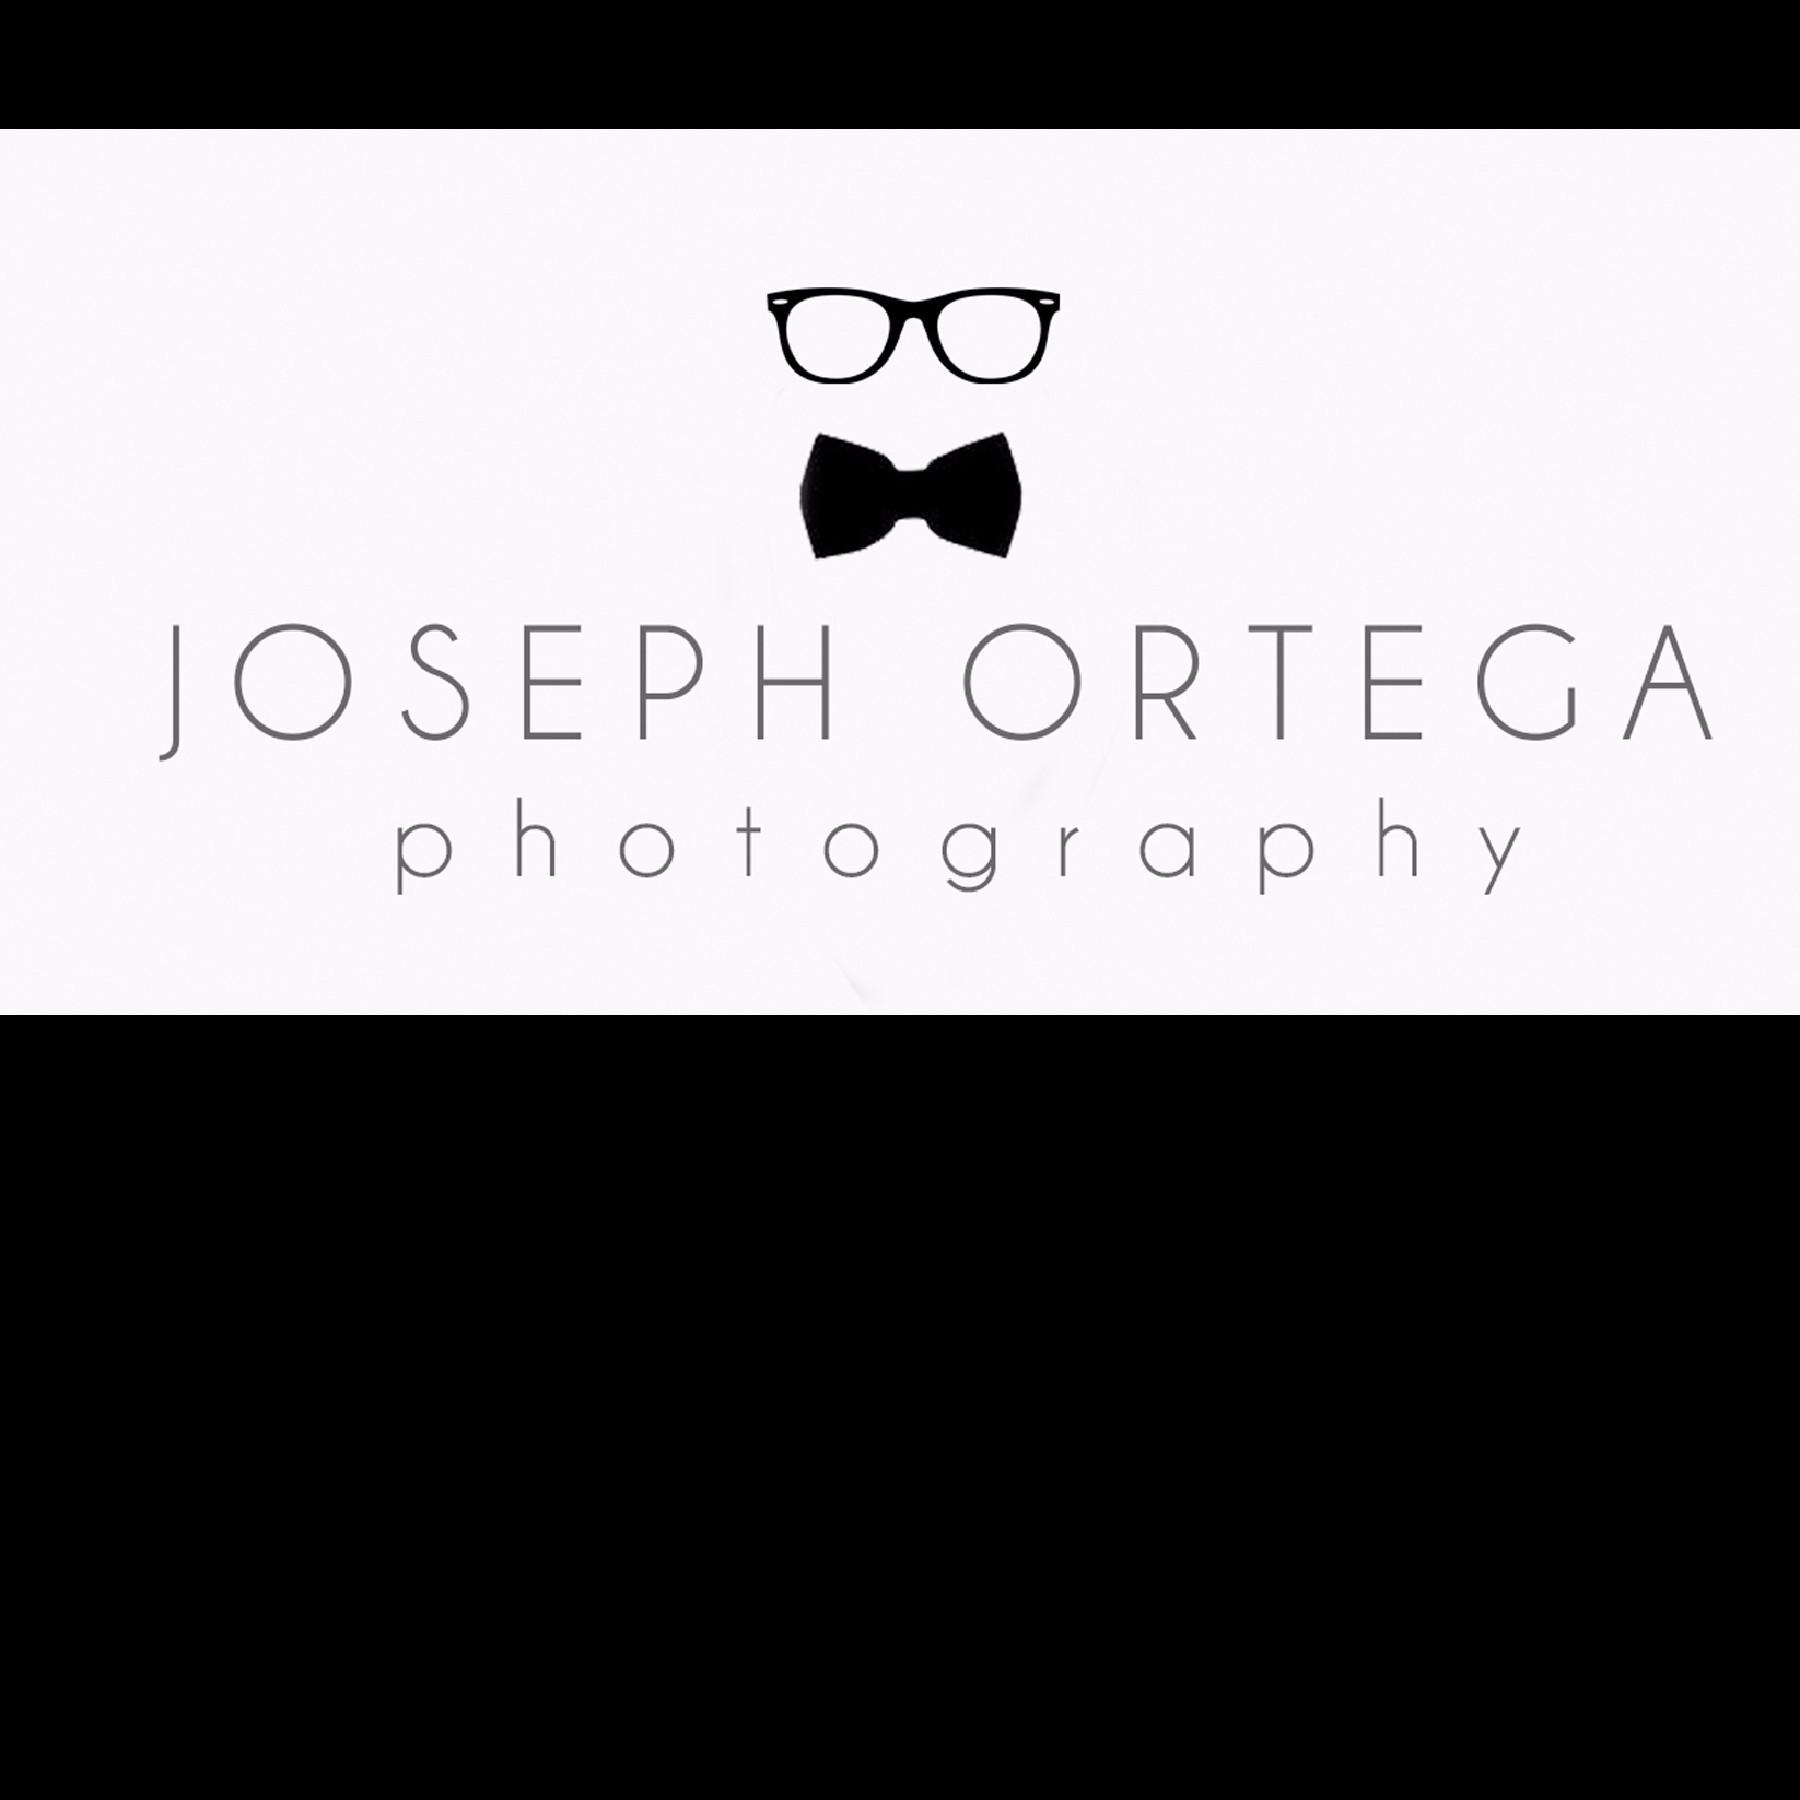 Joseph Ortega Photography